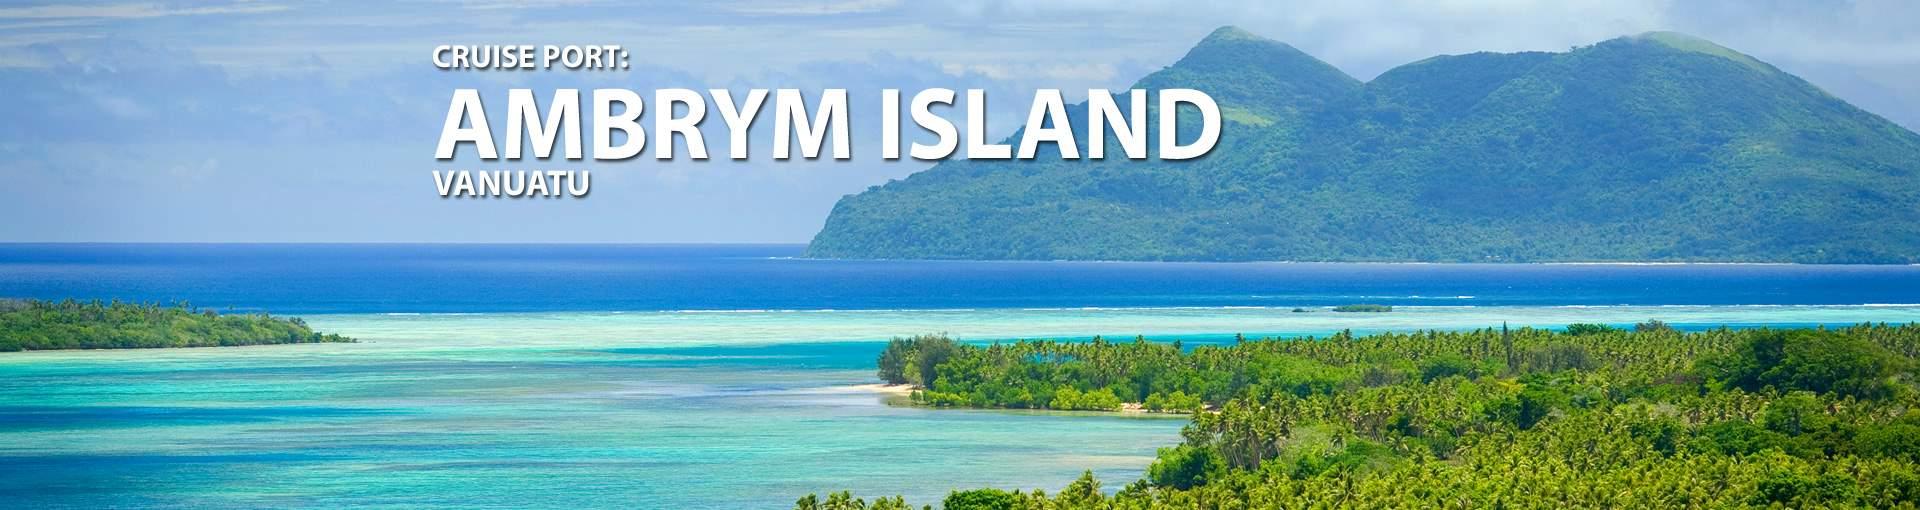 Ambrym Island, Vanuatu Cruise Port